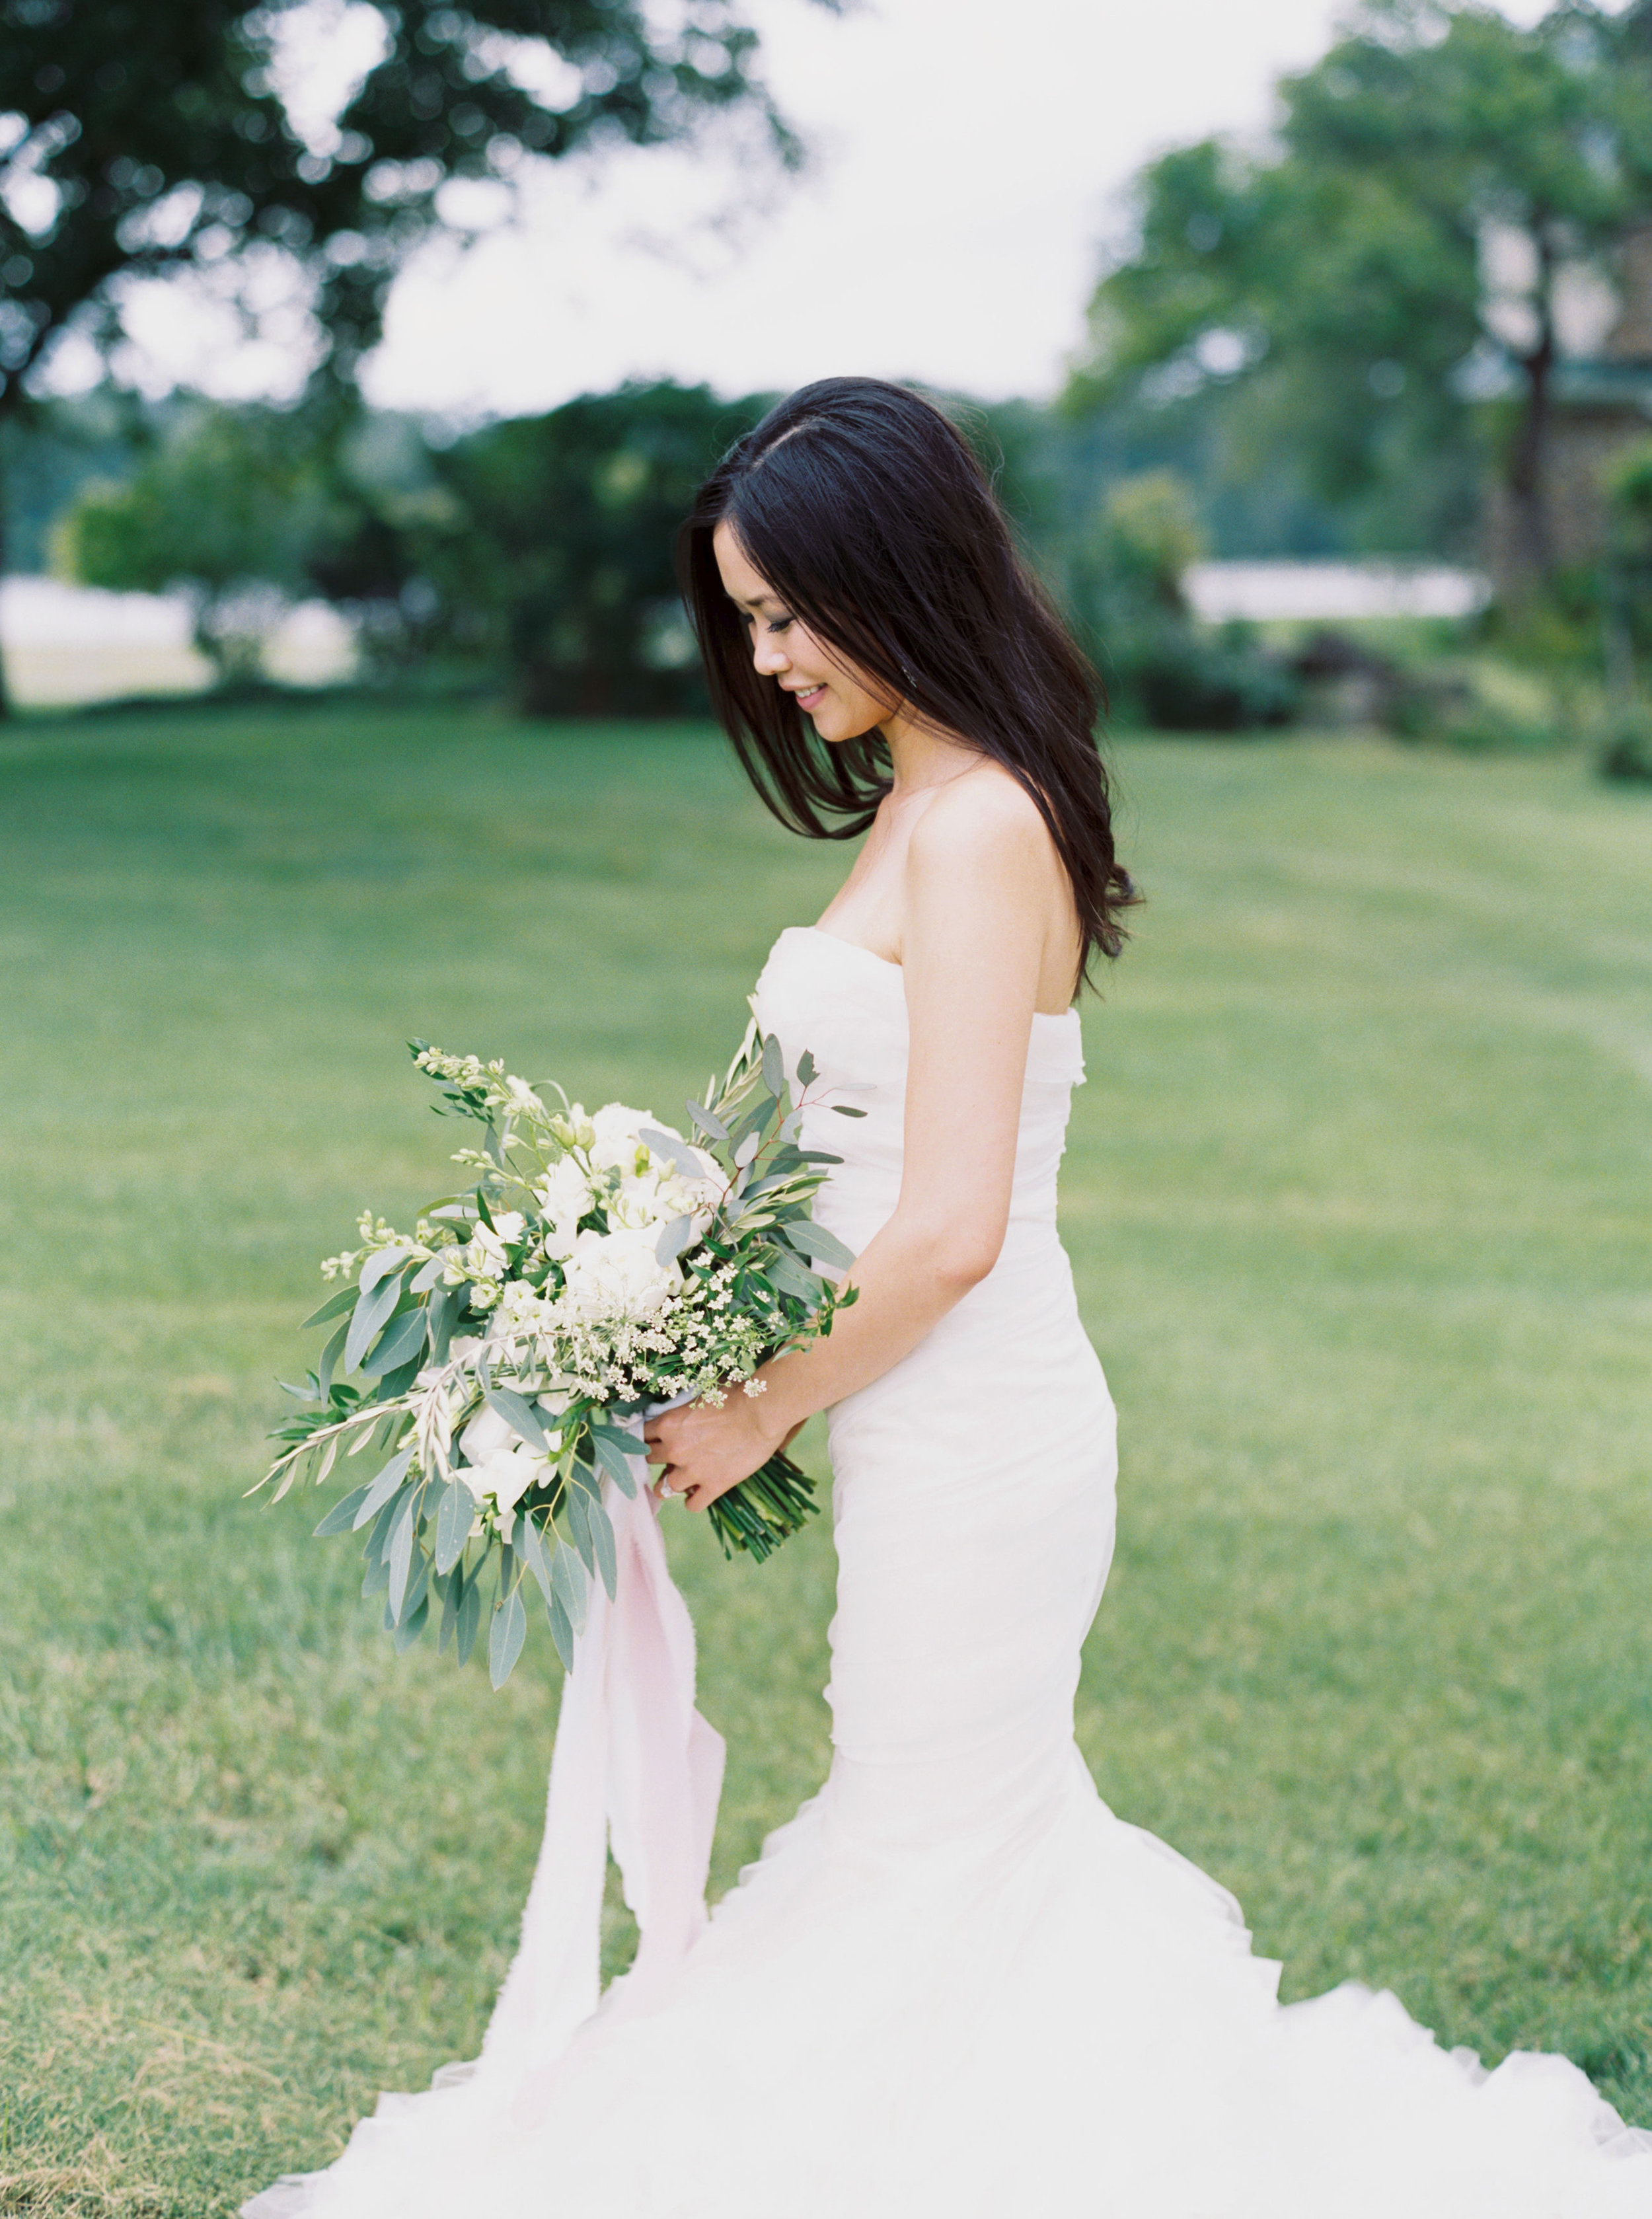 Fionnie_Jacob_Marblegate_Farm_Wedding_Knoxville_Abigail_Malone_Photography-339.jpeg